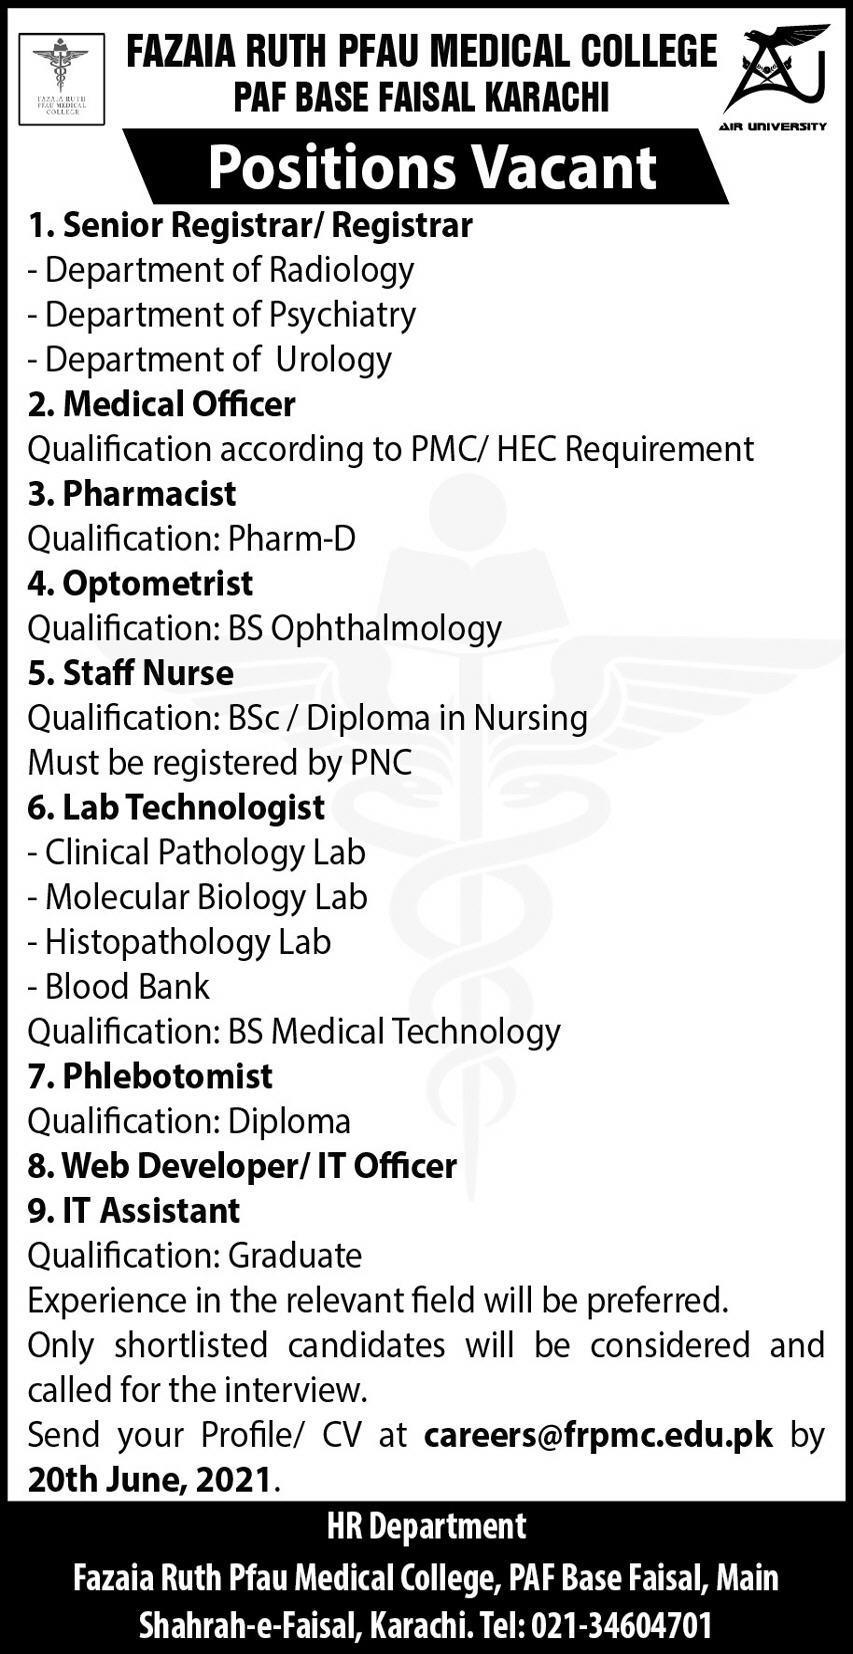 careers@frpmc.edu.pk - Fazaia Ruth Pfau Medical College PAF Base Faisal Karachi Jobs 2021 in Pakistan